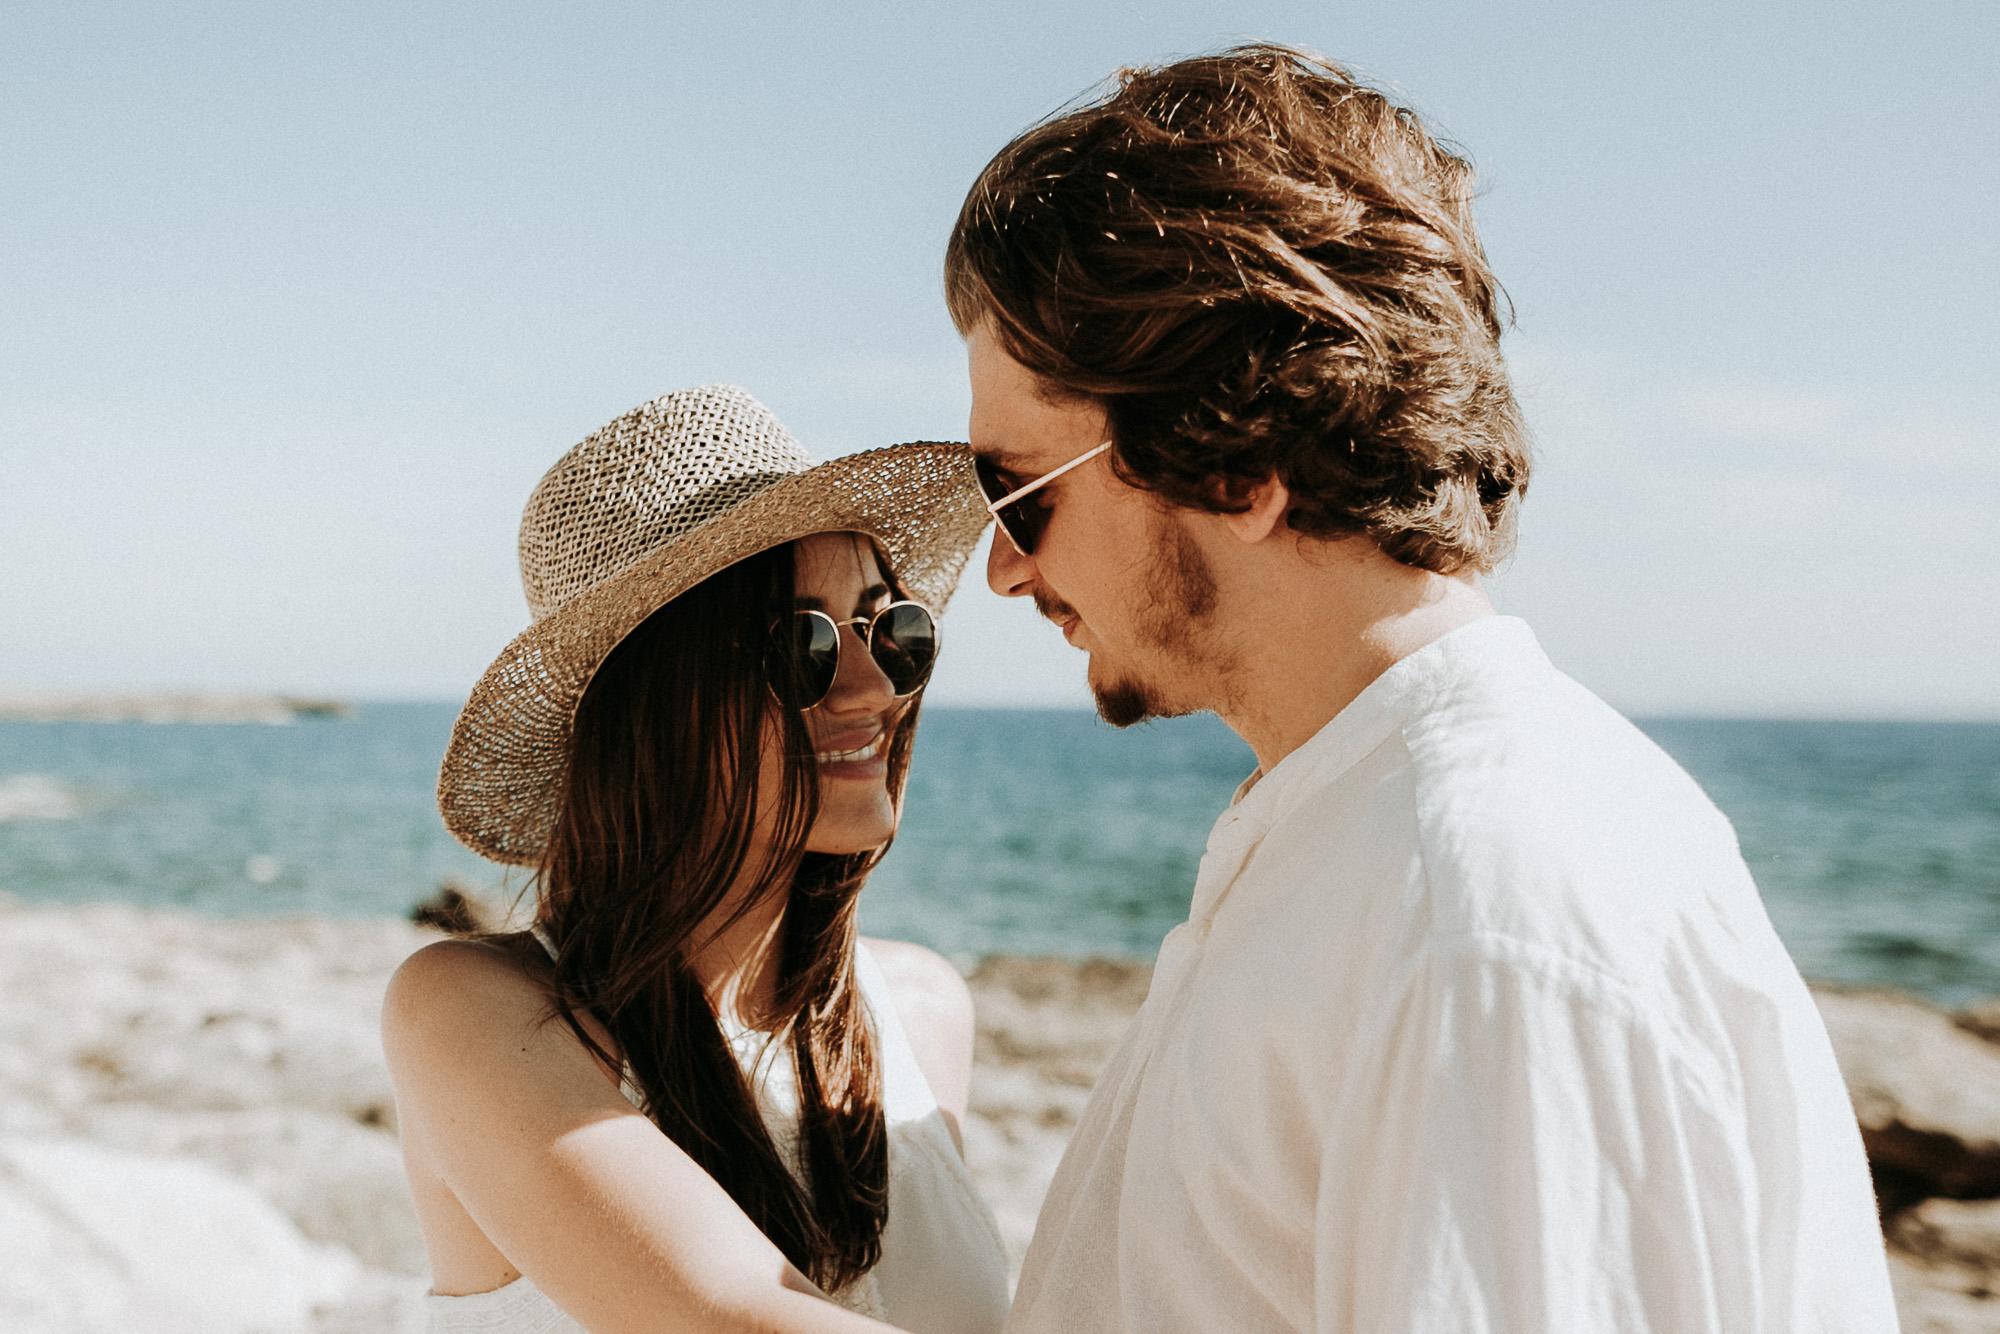 DanielaMarquardtPhotography_wedding_elopement_mallorca_spain_stjordi_sessalines_marinaandxavi373